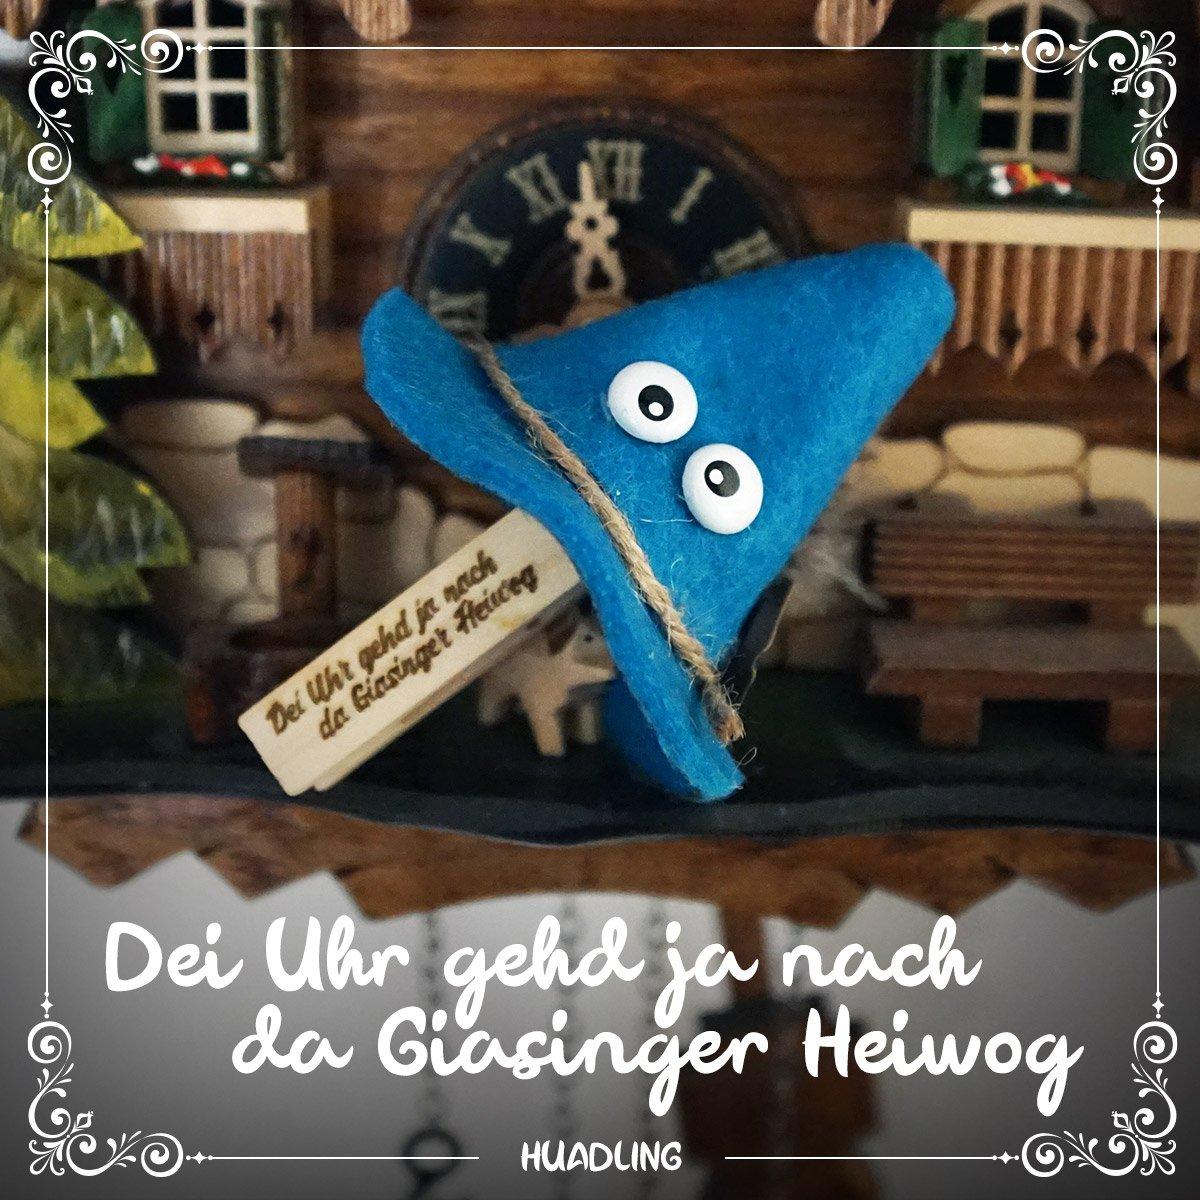 Bavarianquotes Hashtag On Twitter